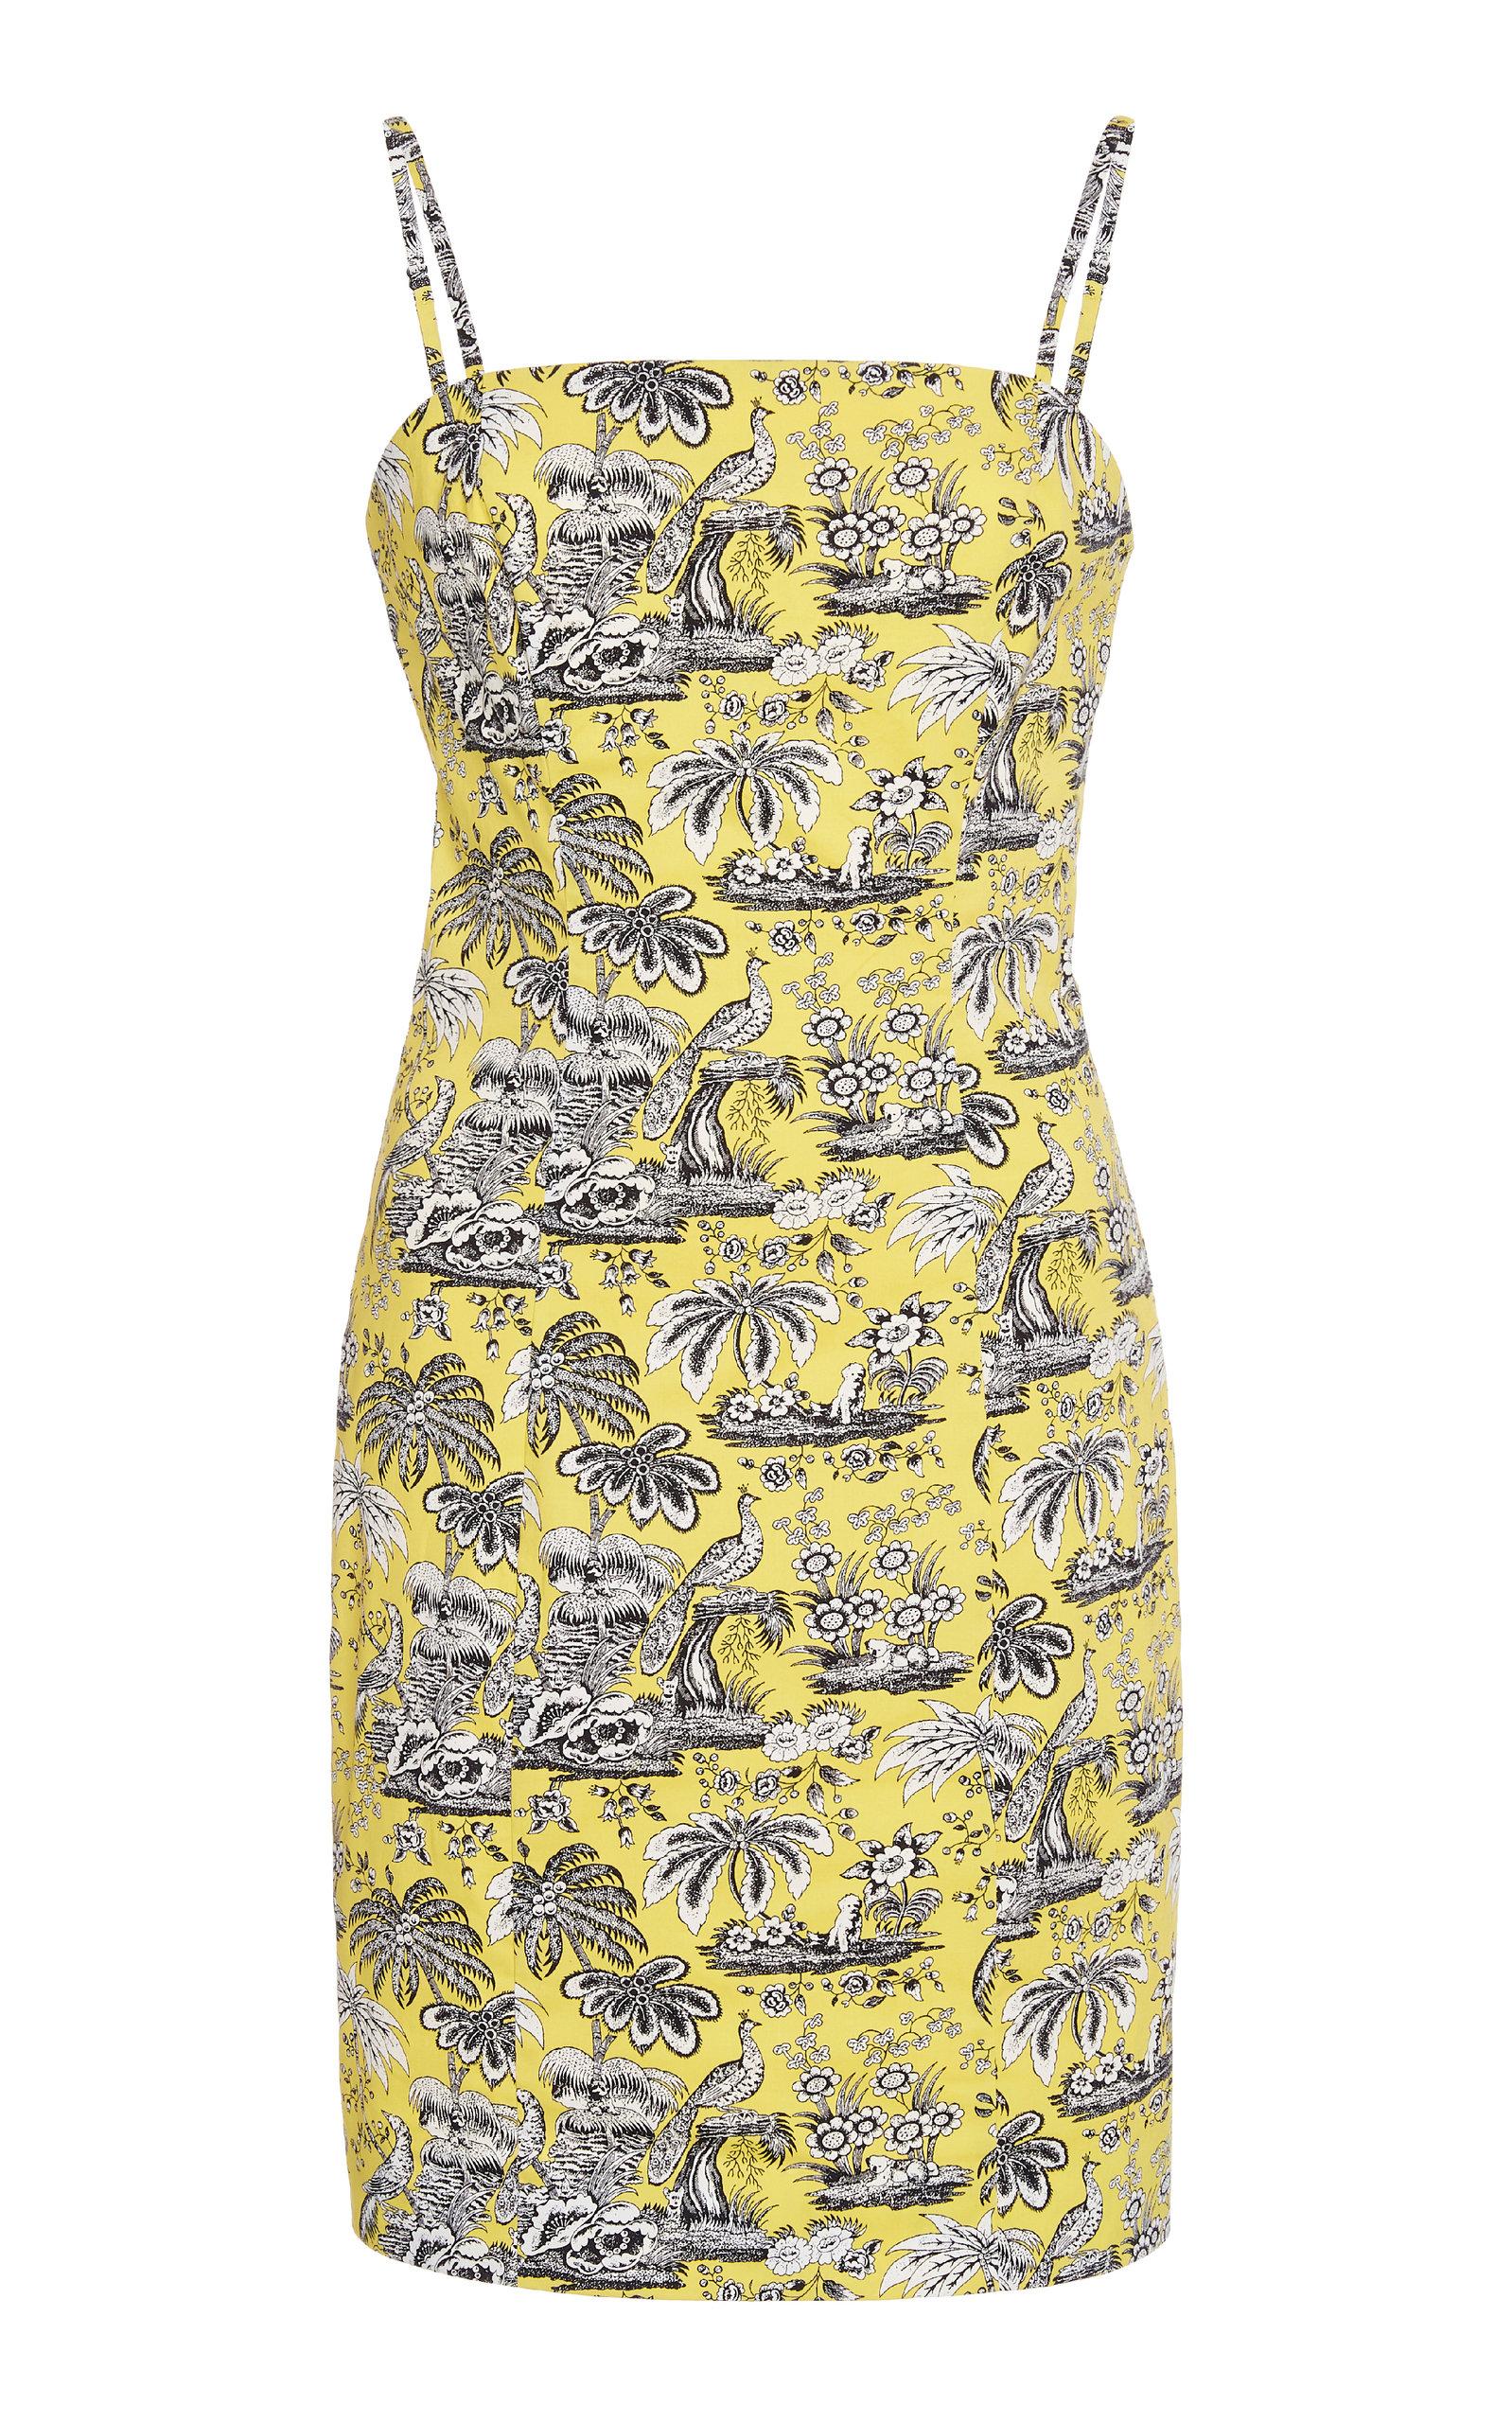 Buy Staud Basset Printed Poplin Dress online, shop Staud at the best price